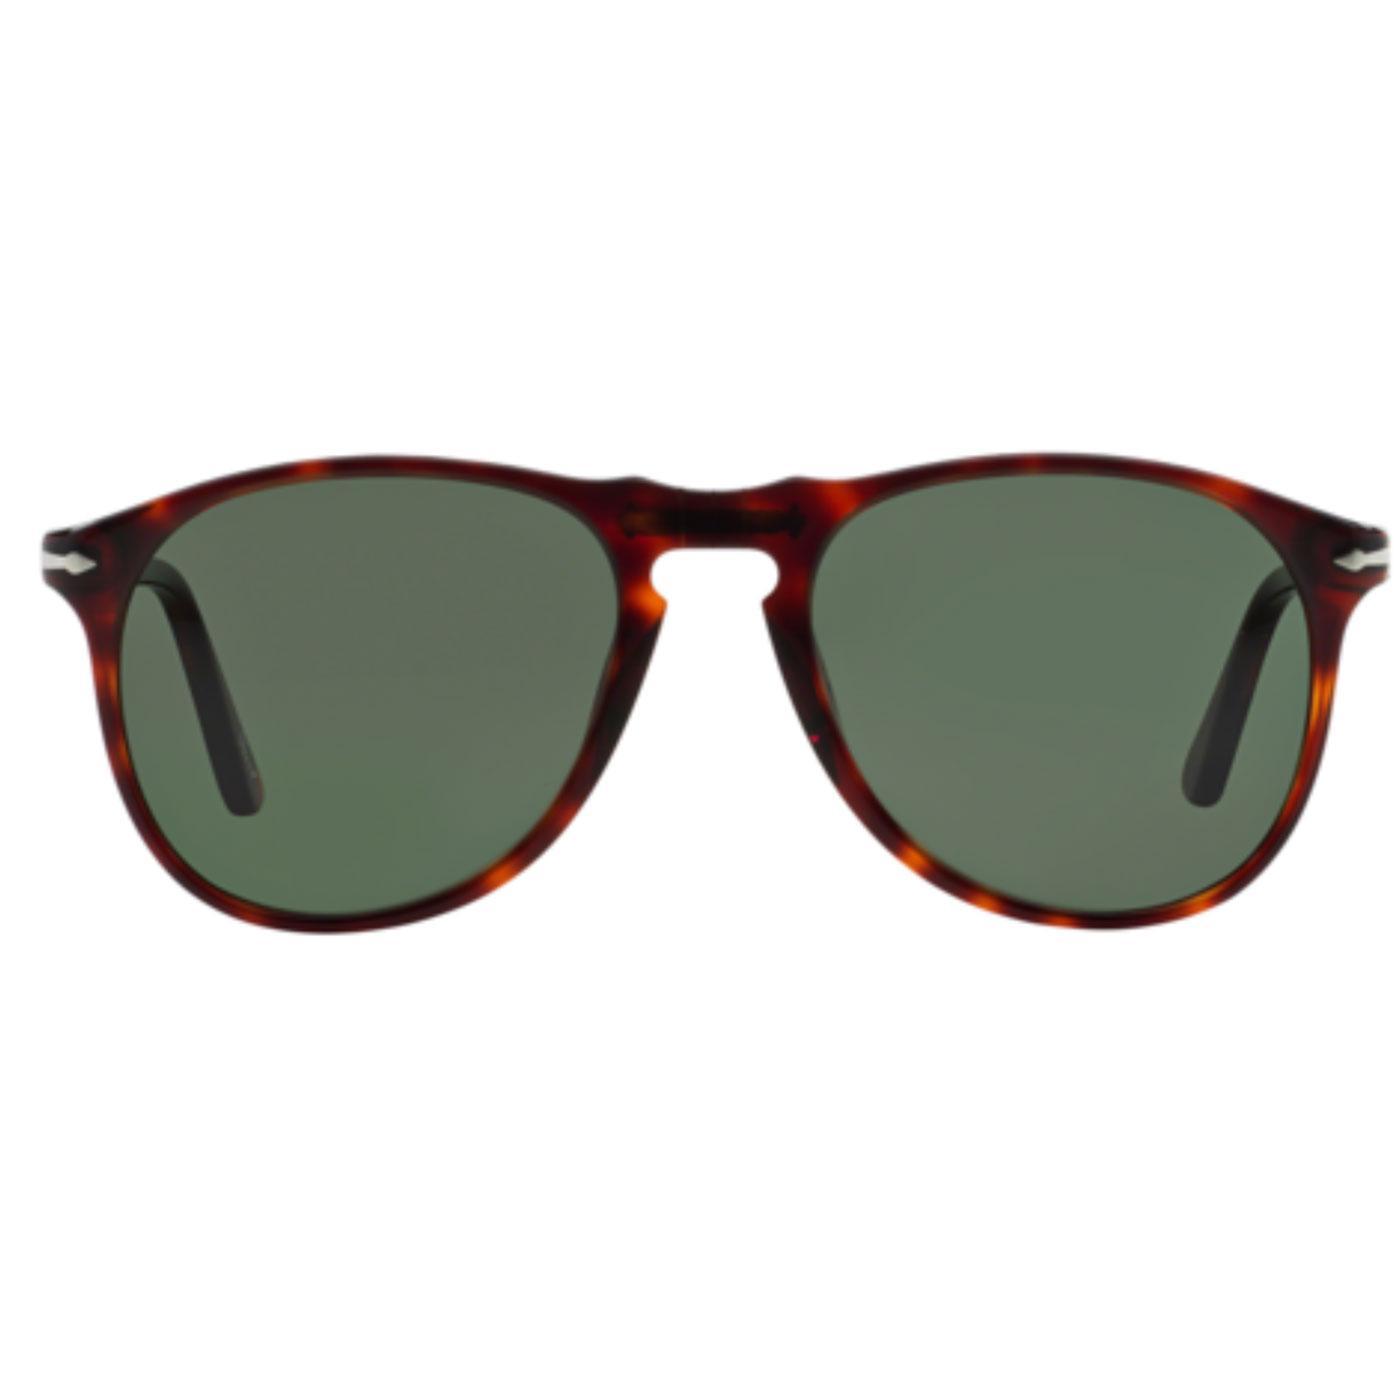 649 Series PERSOL Original Mod Sunglasses HAVANA